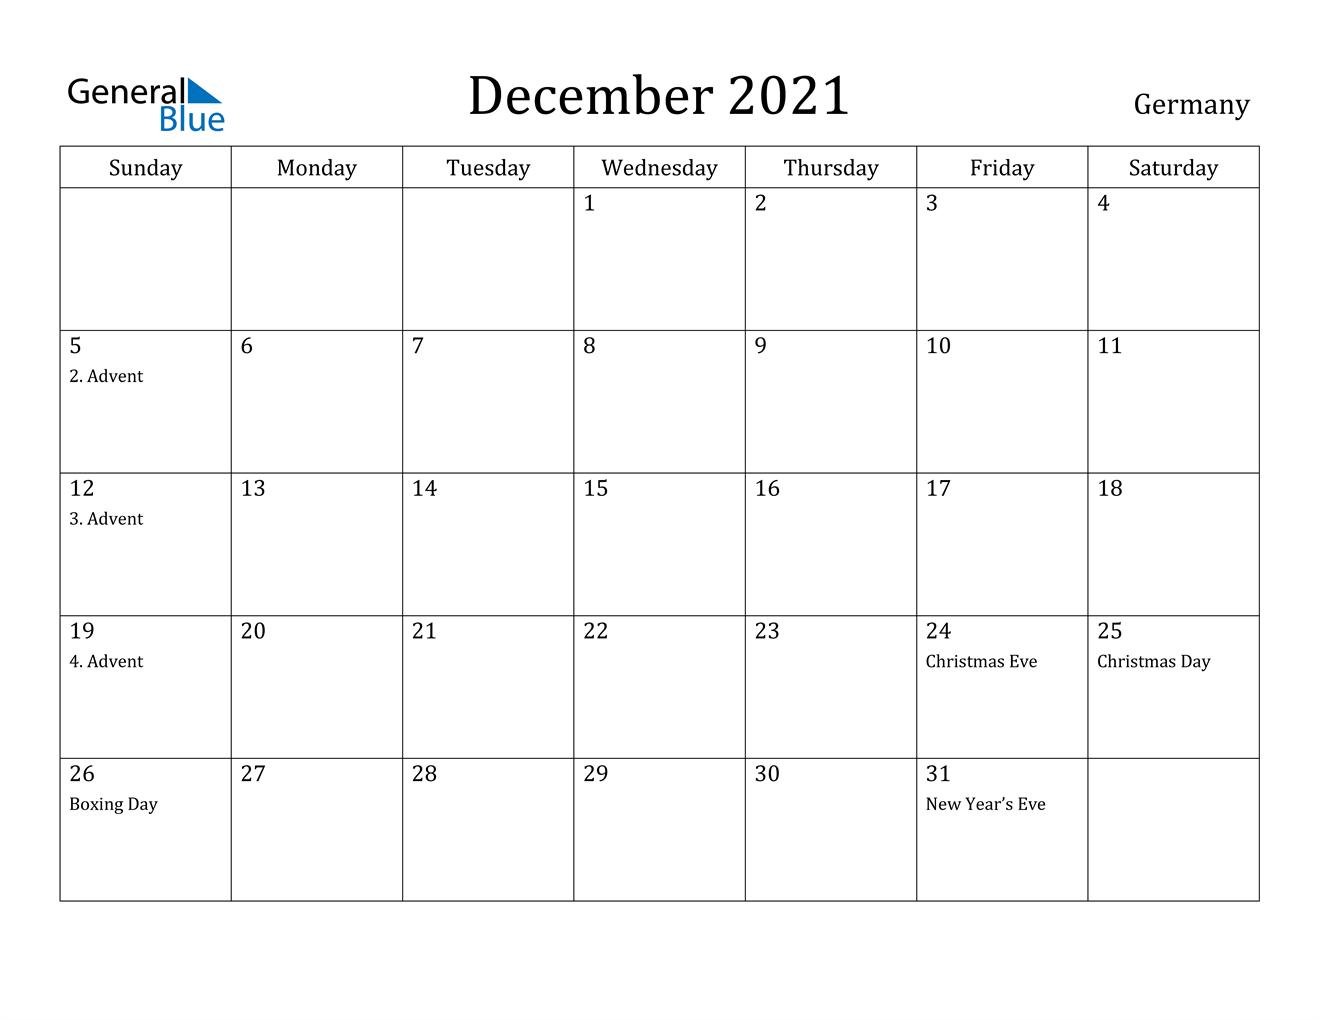 December 2021 Calendar - Germany